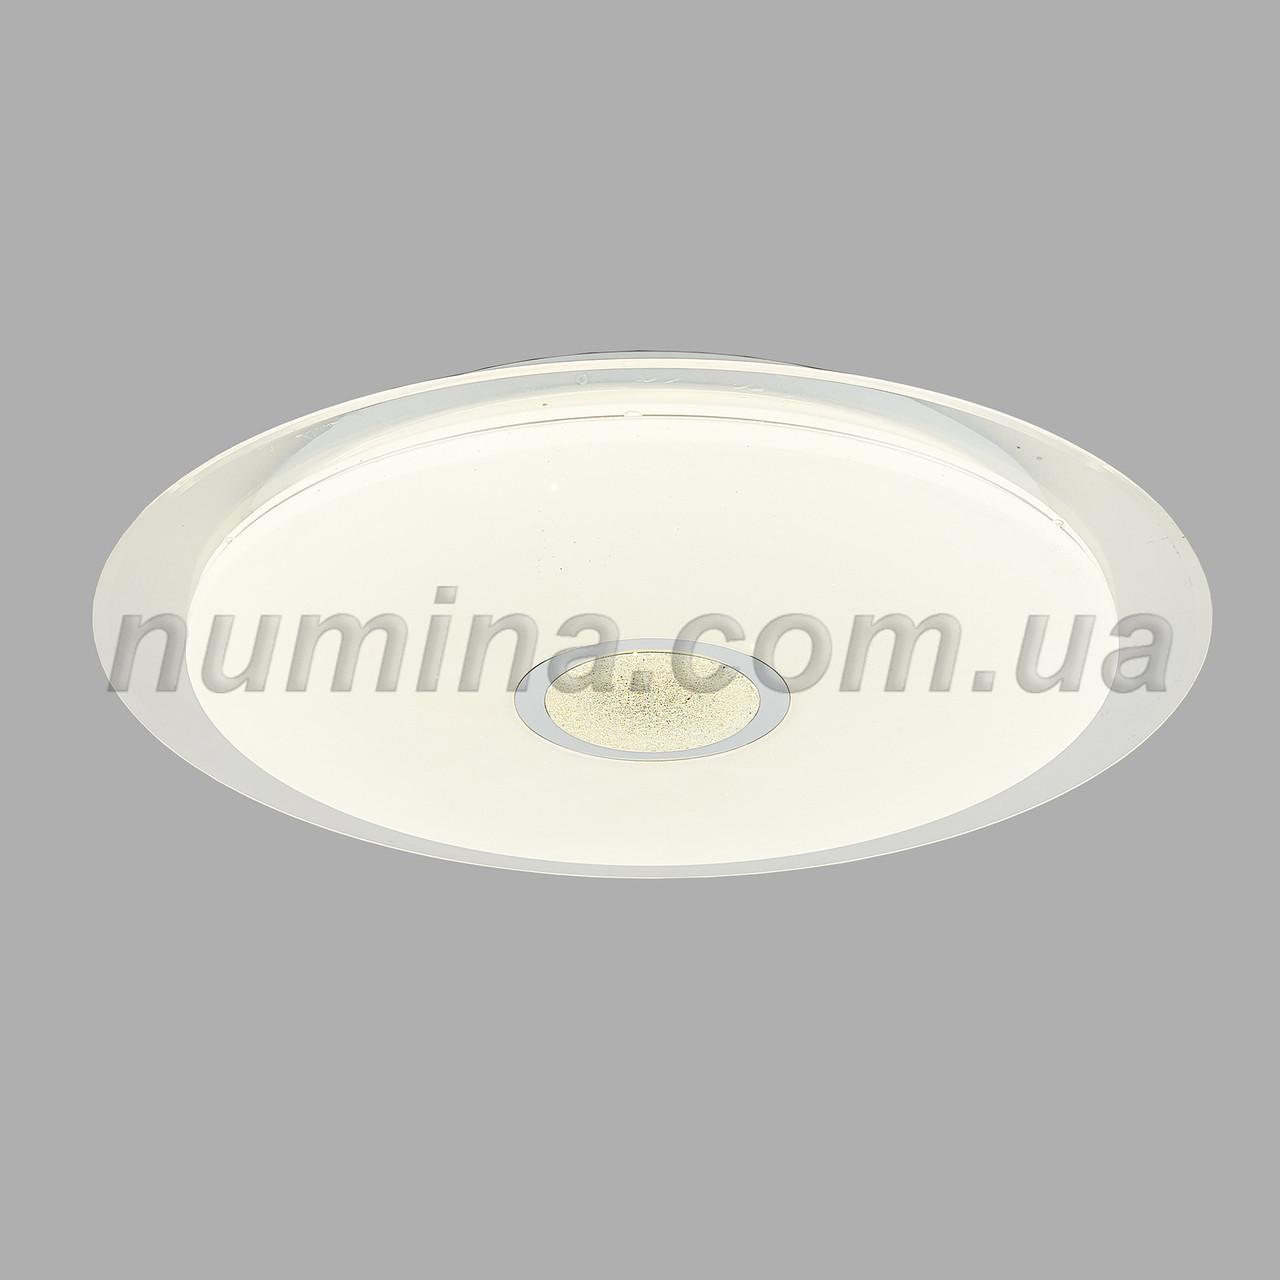 Люстра потолочная LED 69-1717-S 36W+пульт